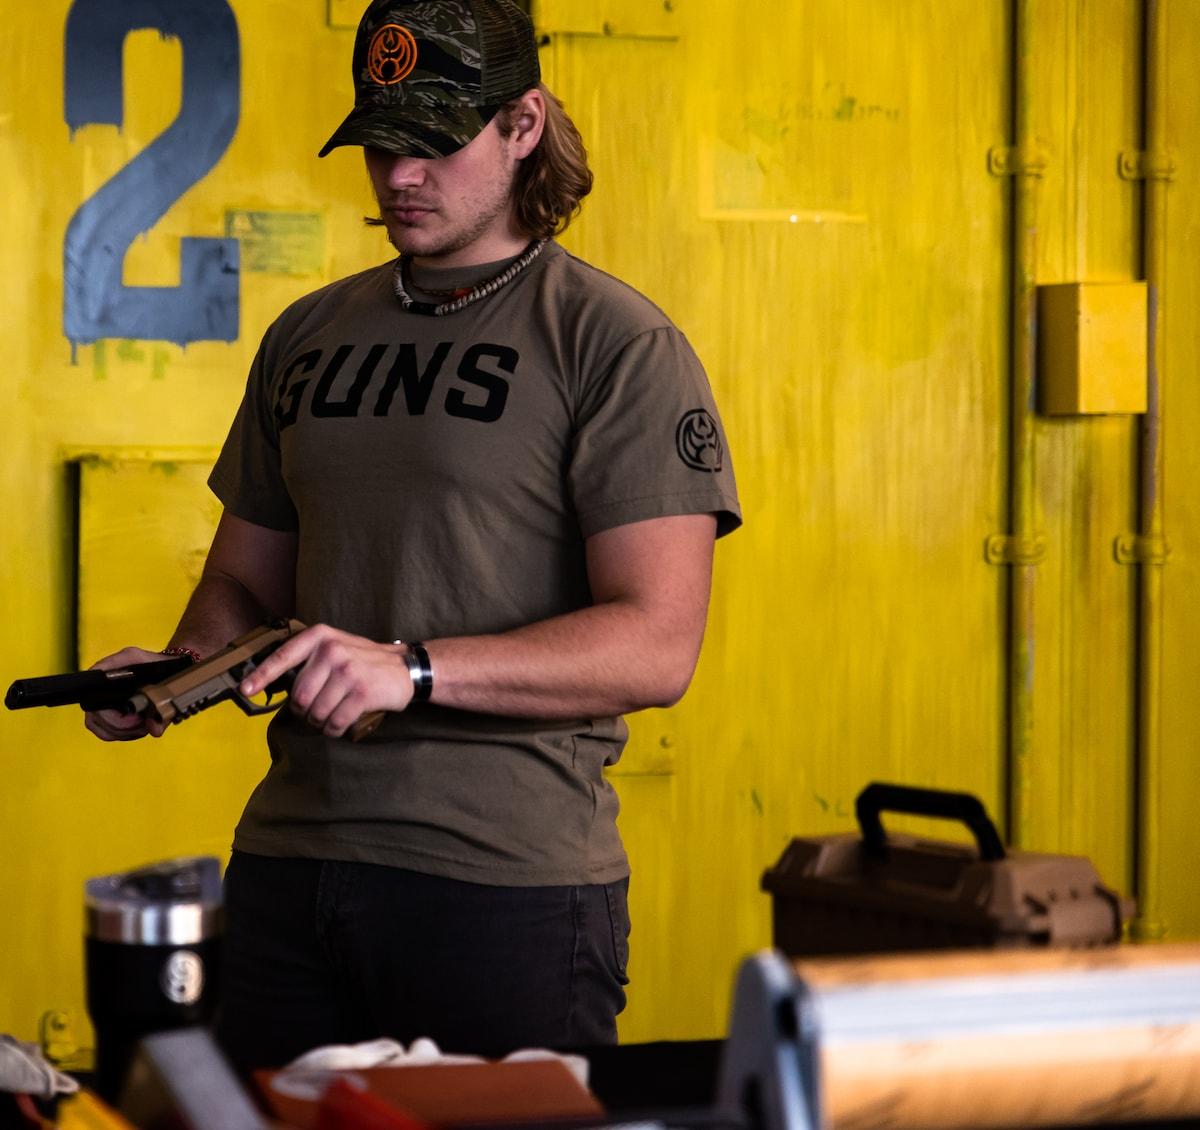 """GUNS"" MILITARY TEE"